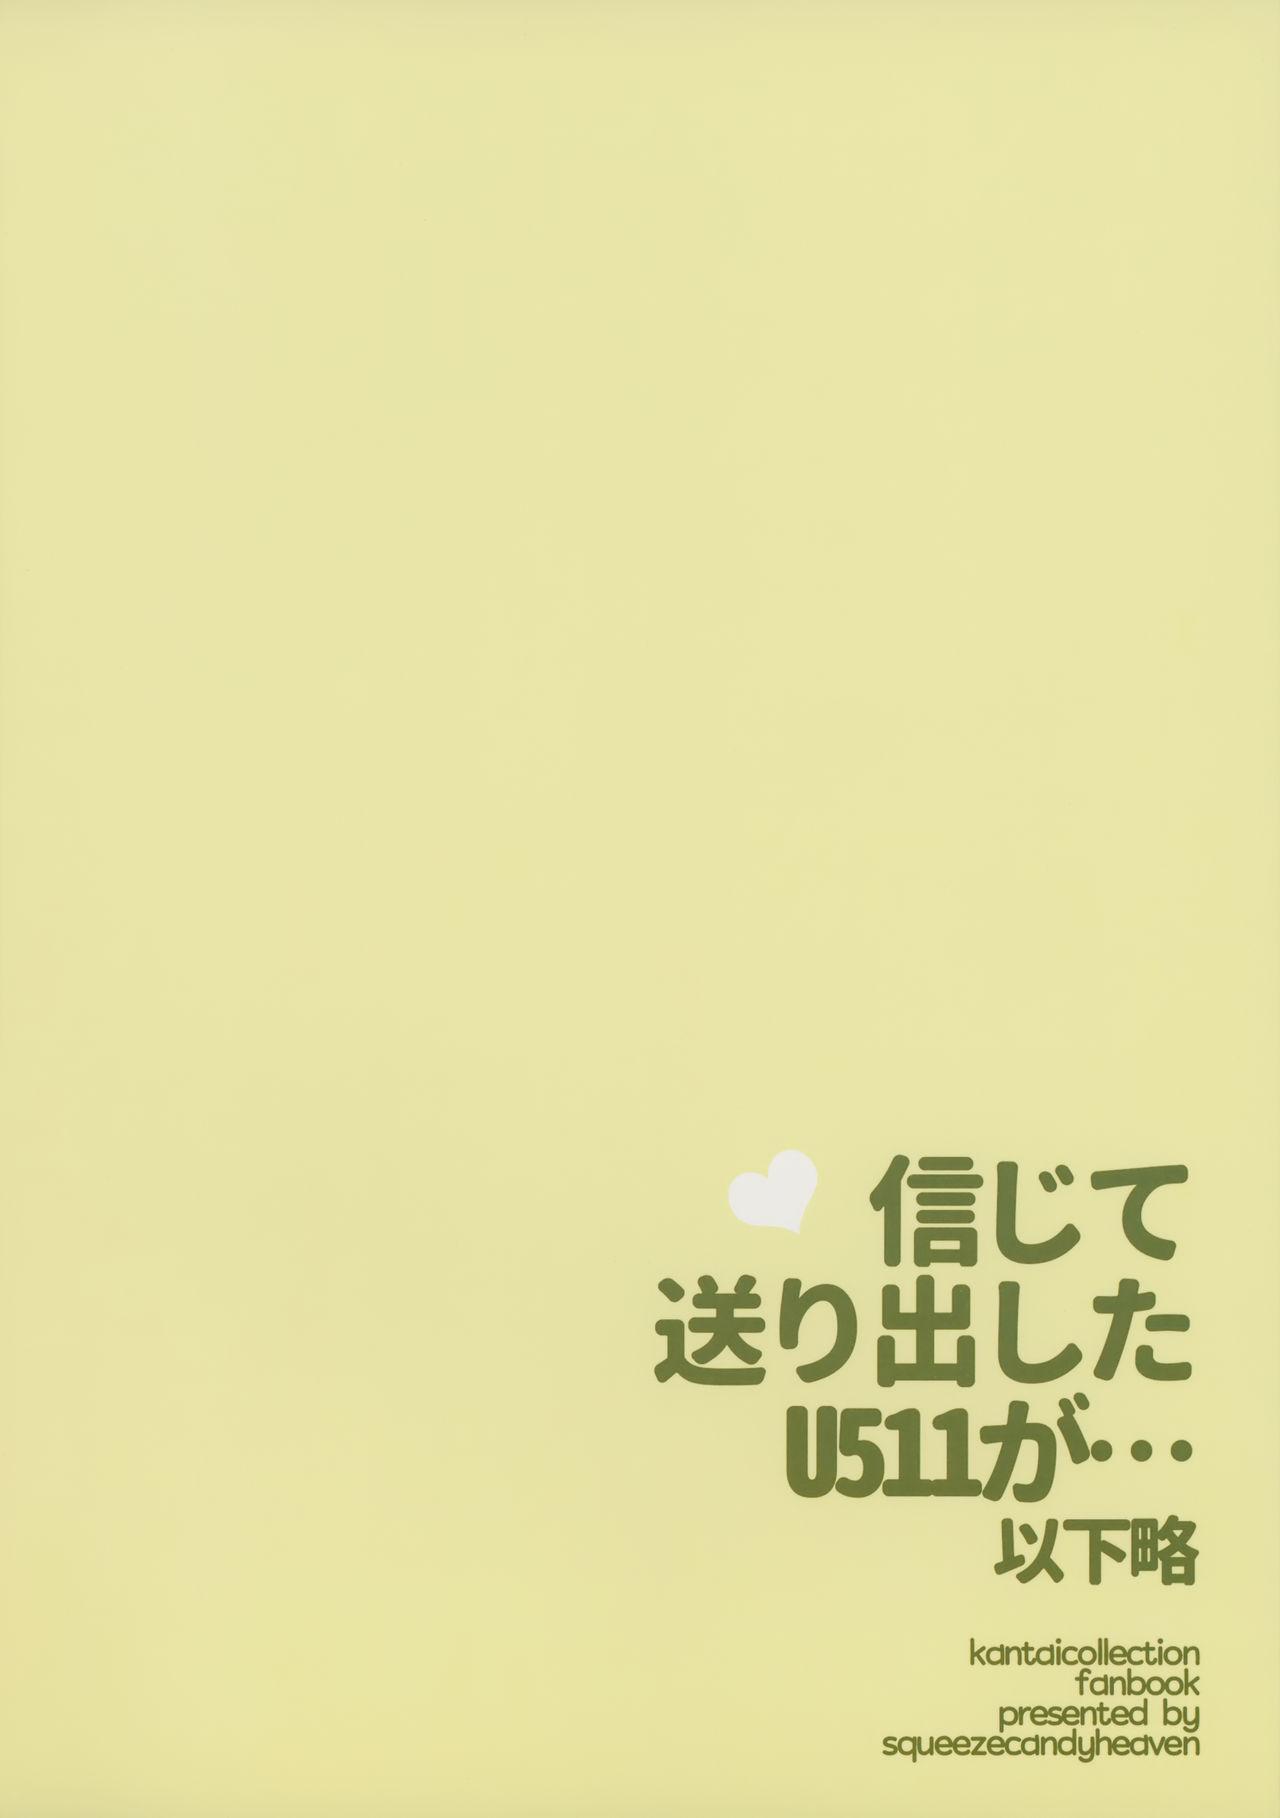 (CSP6) [squeezecandyheaven (Ichihaya)] Shinjite Okuridashita U-511 Ga...Ikaryaku | The U-511 They Trusted Out Was... -Omitted- (Kantai Collection -KanColle-) [English] [ATF] 17